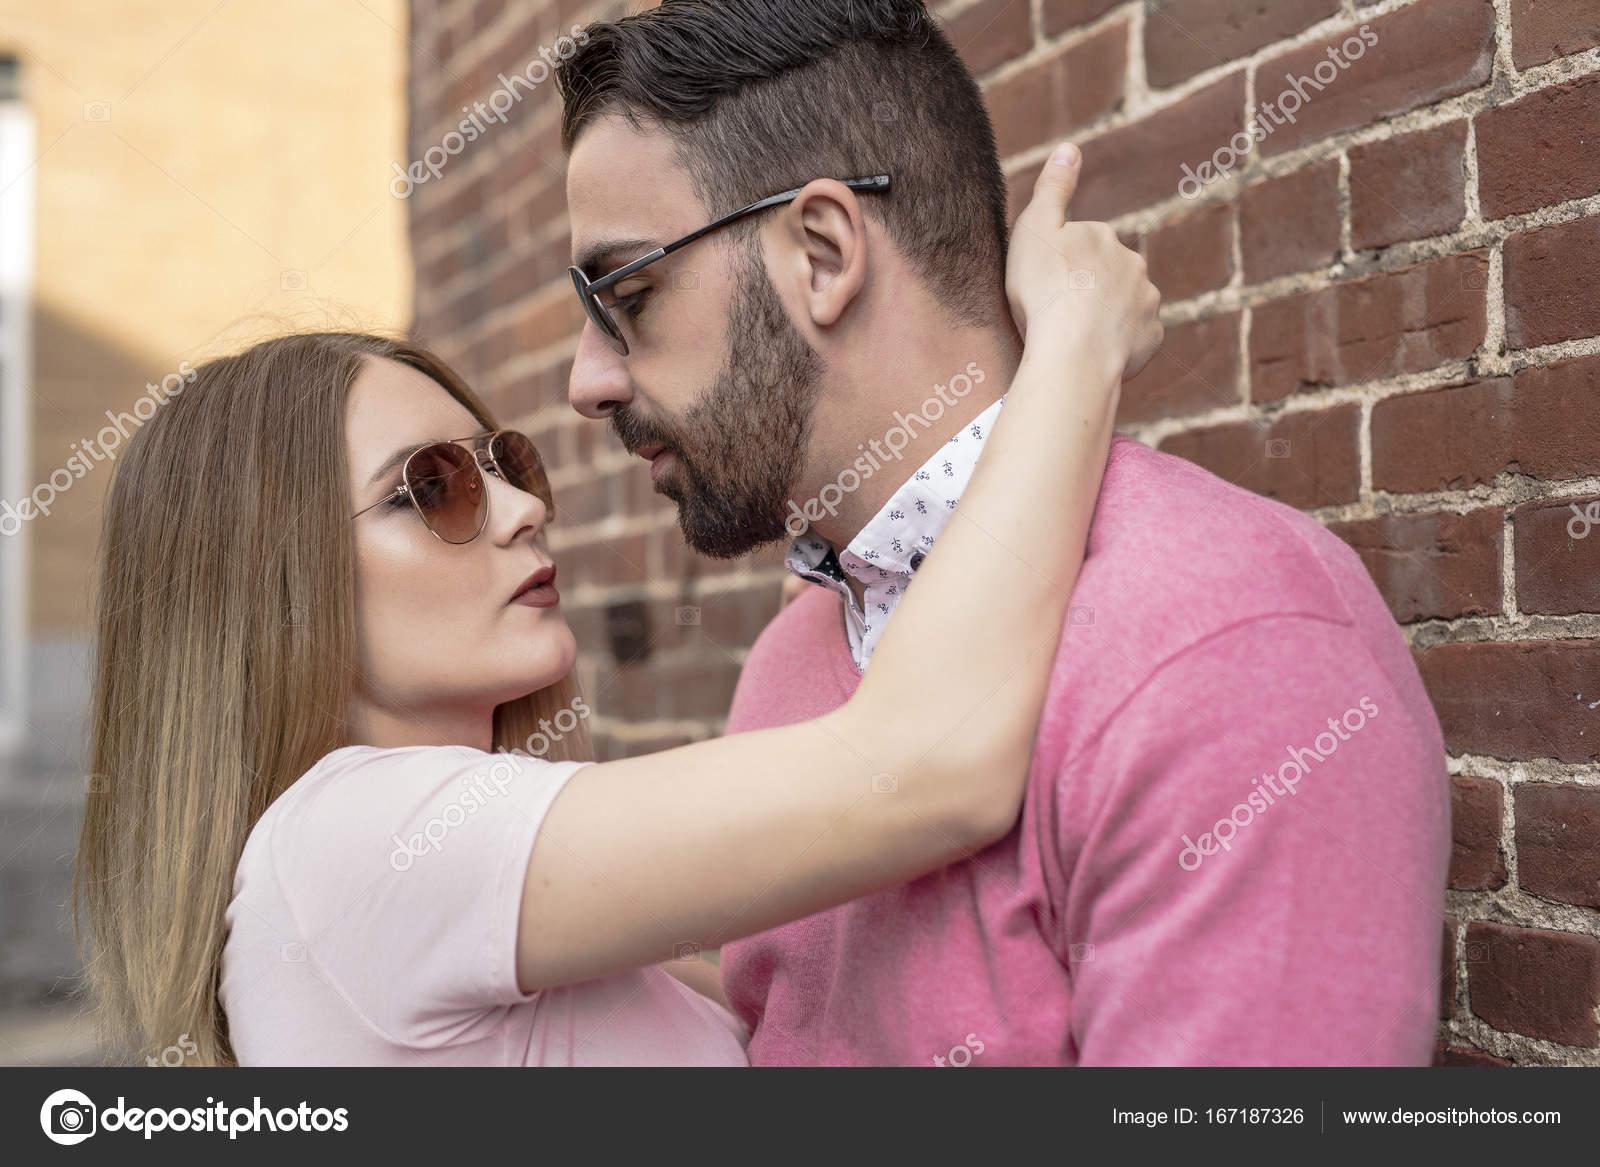 Telefone dating